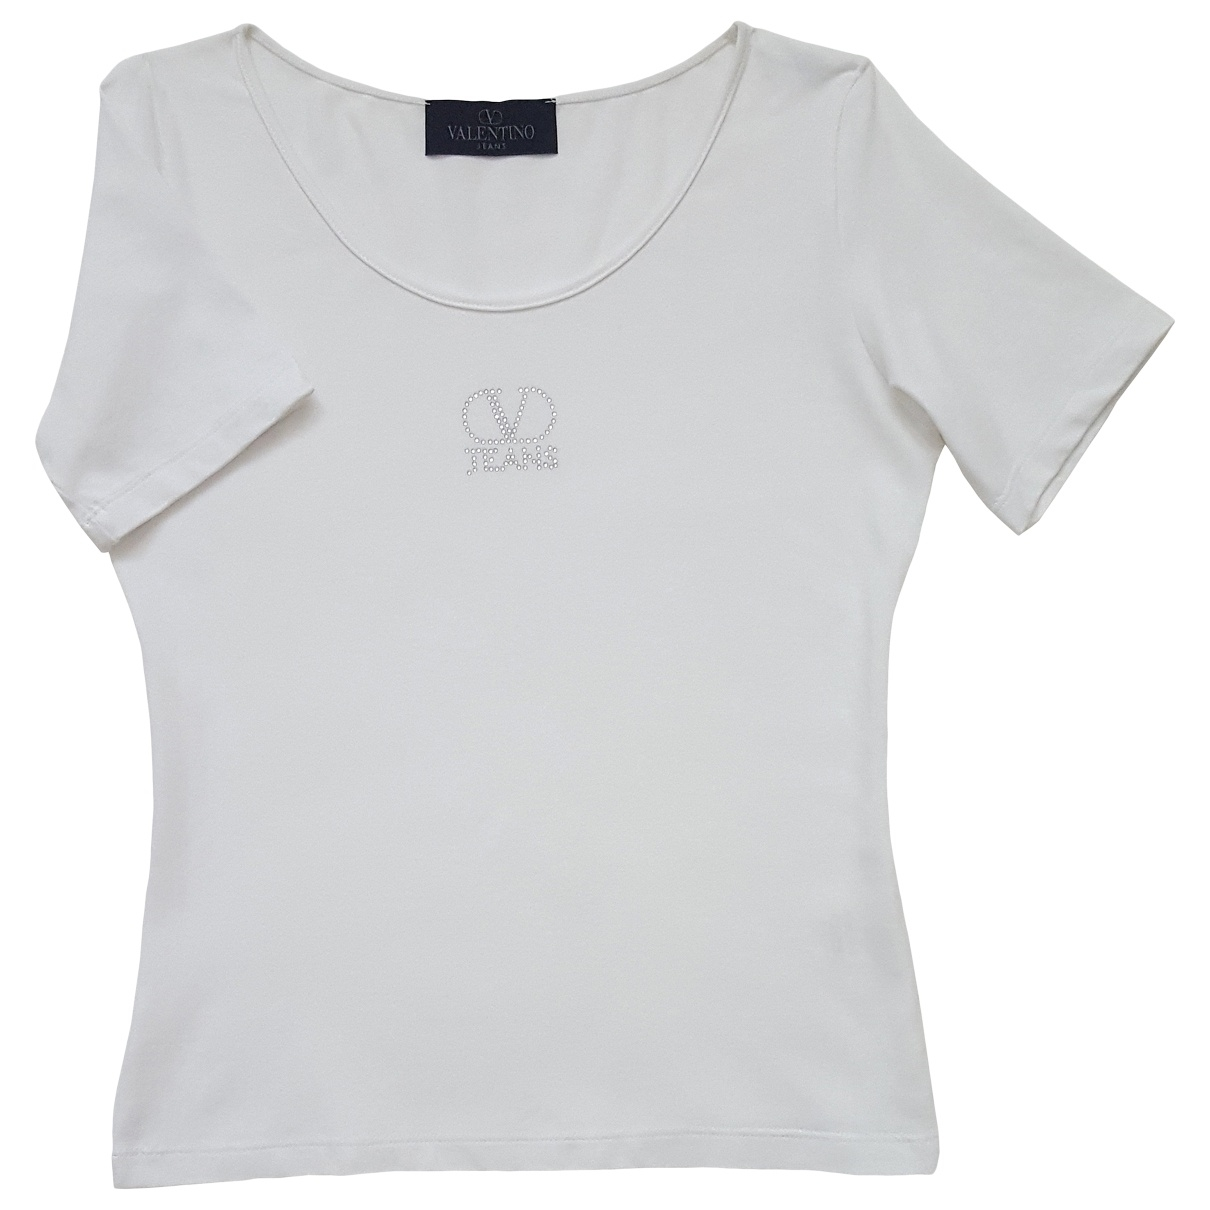 Valentino Garavani - Top   pour femme - blanc